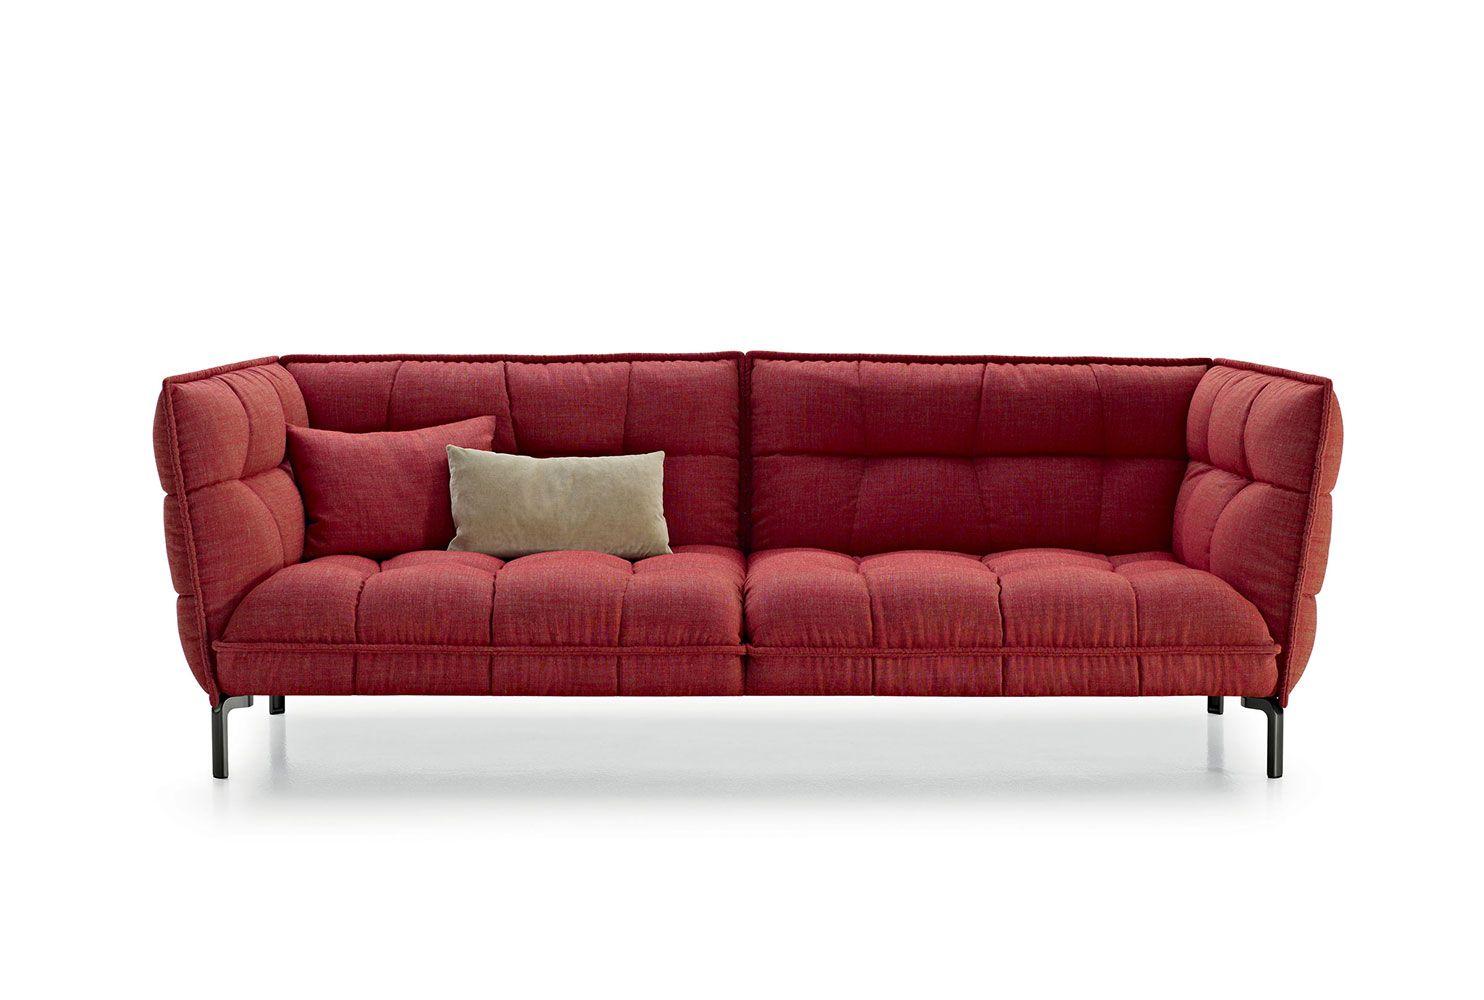 1000 images about sofas on pinterest b amp b italia patricia bb italia furniture prices